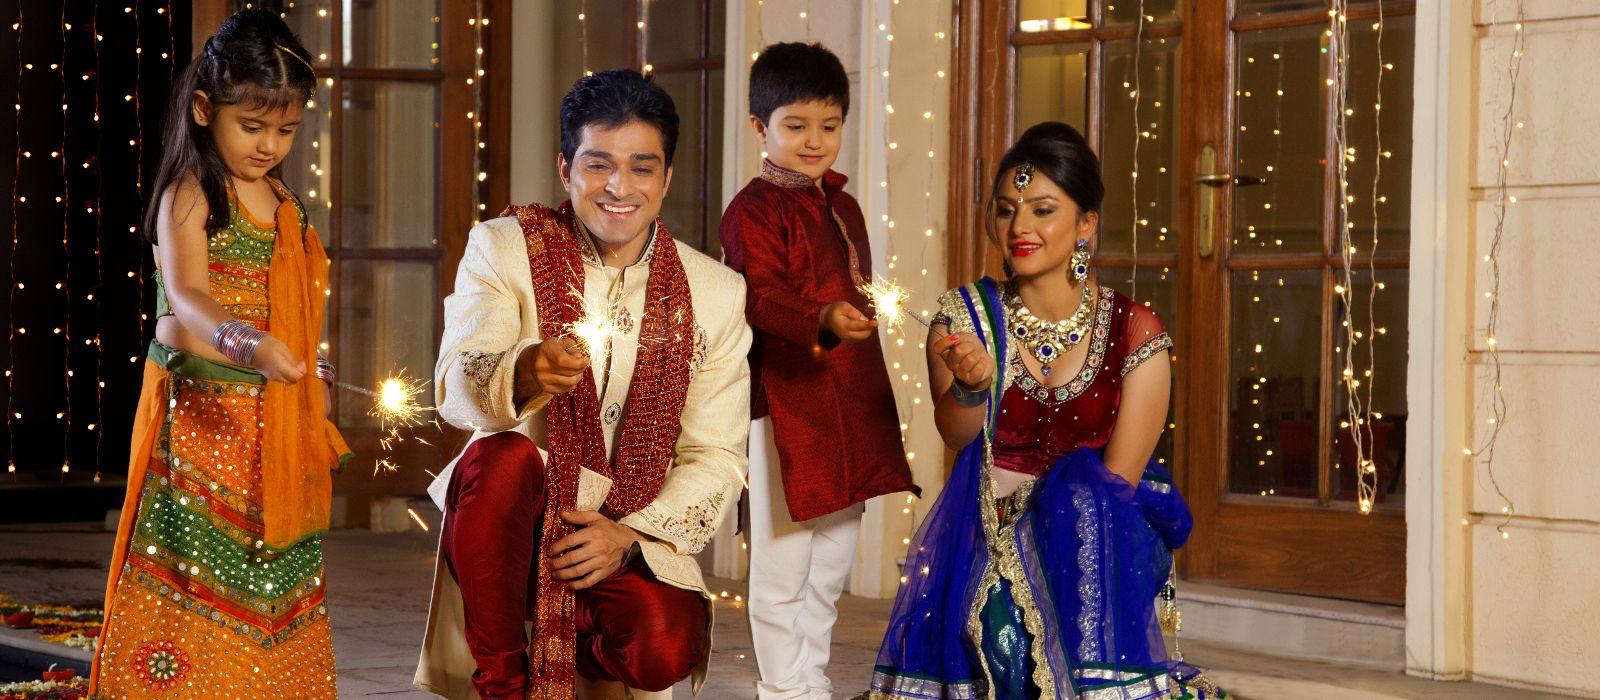 Festive Fever: Diwali in India Tour Trip 2